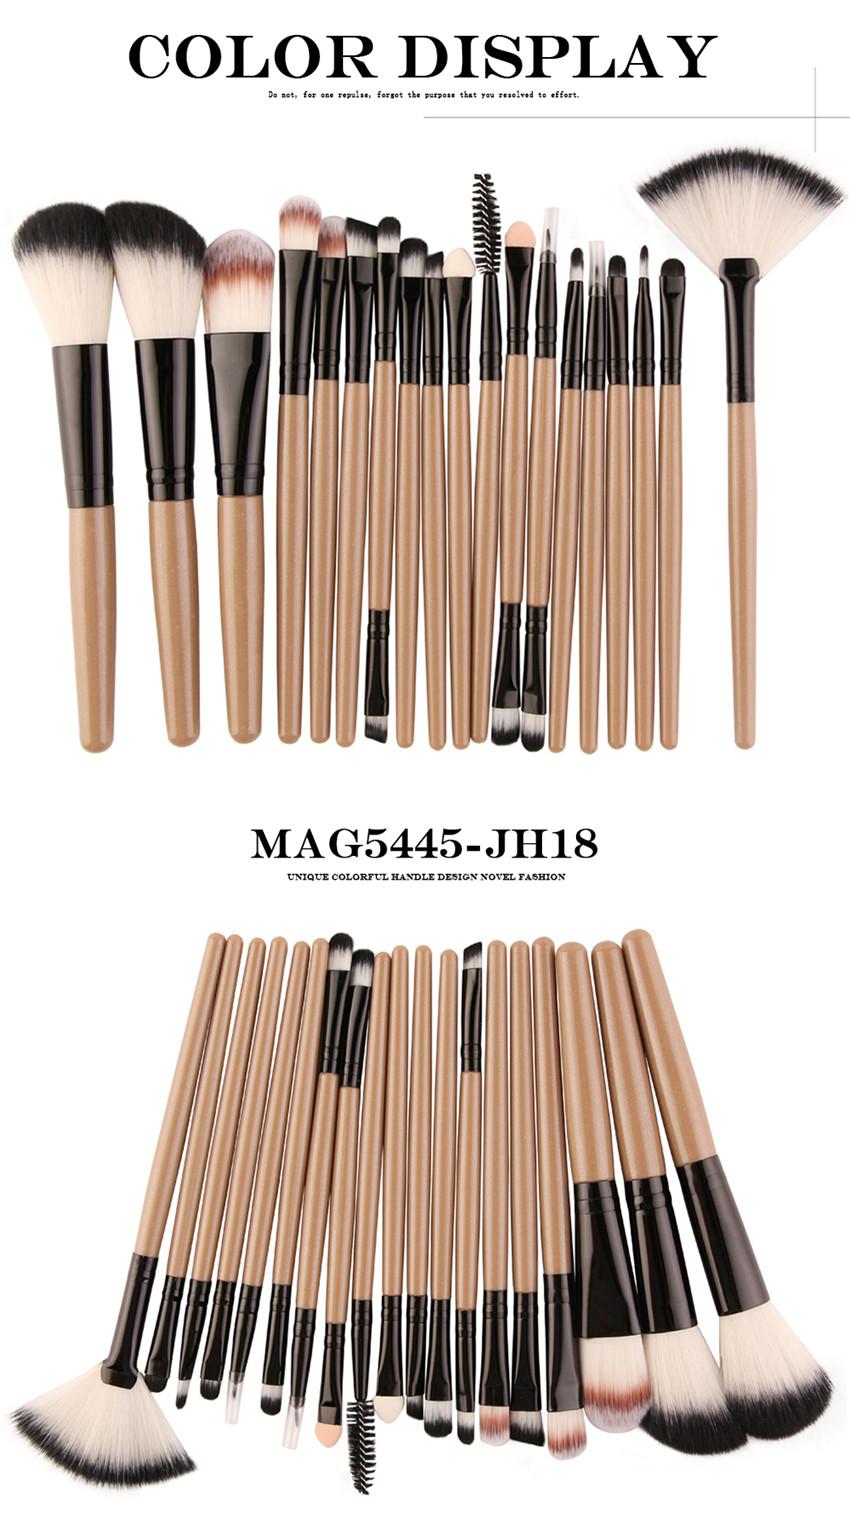 18Pcs/lot Brand Brushes Makeup Brush Set maquiagem Cosmetics Power Foundation Blush Eye Shadow Blending Fan Make Up Kits Beauty 13